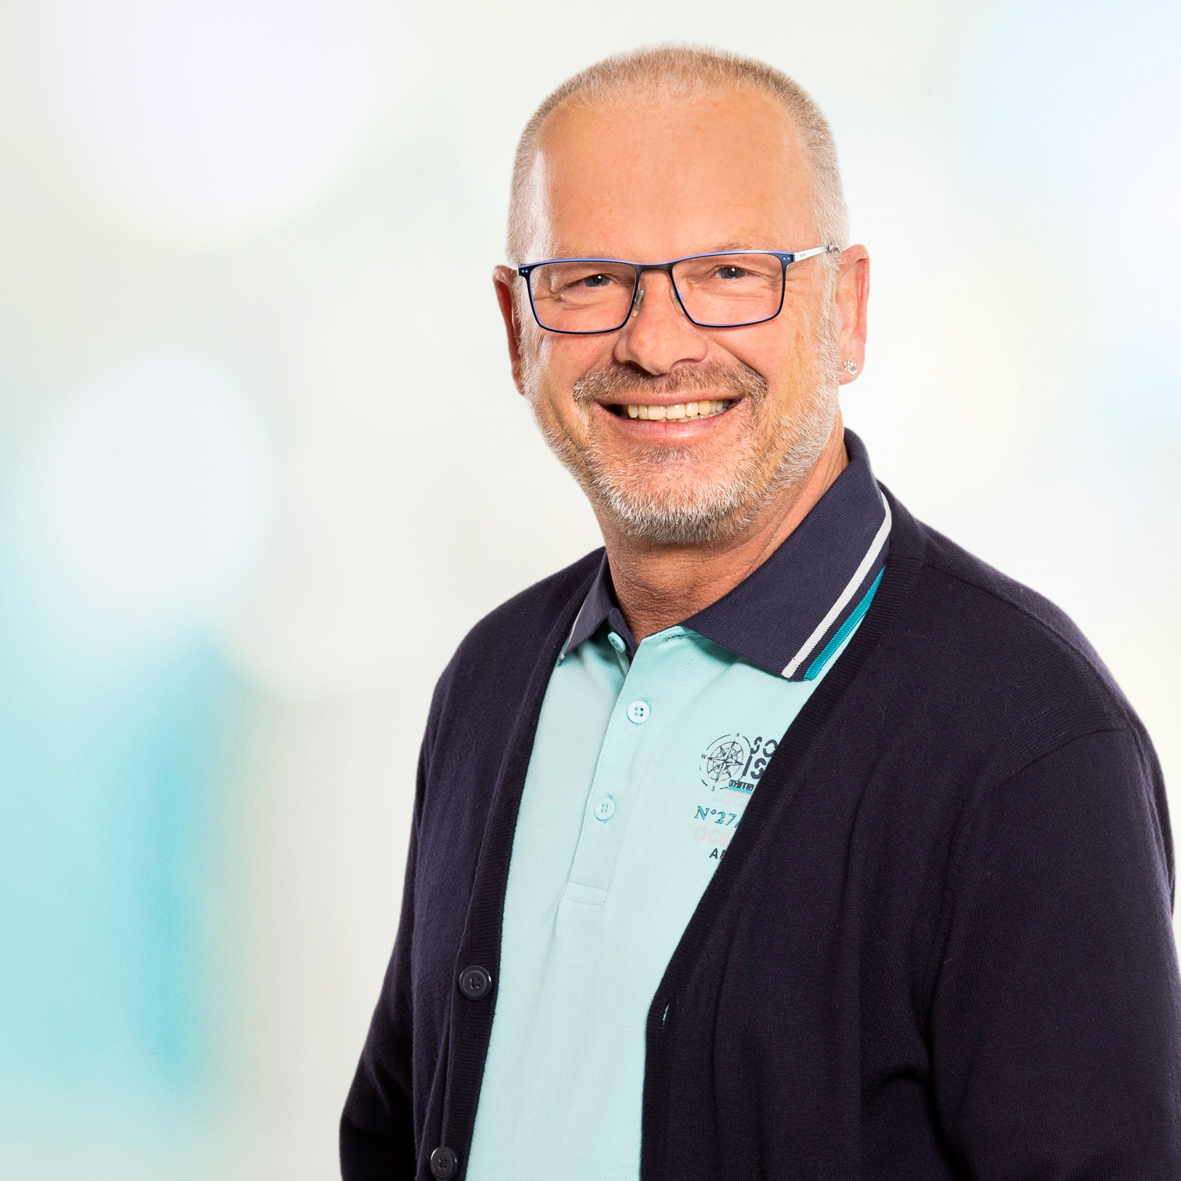 Rolf Fittje